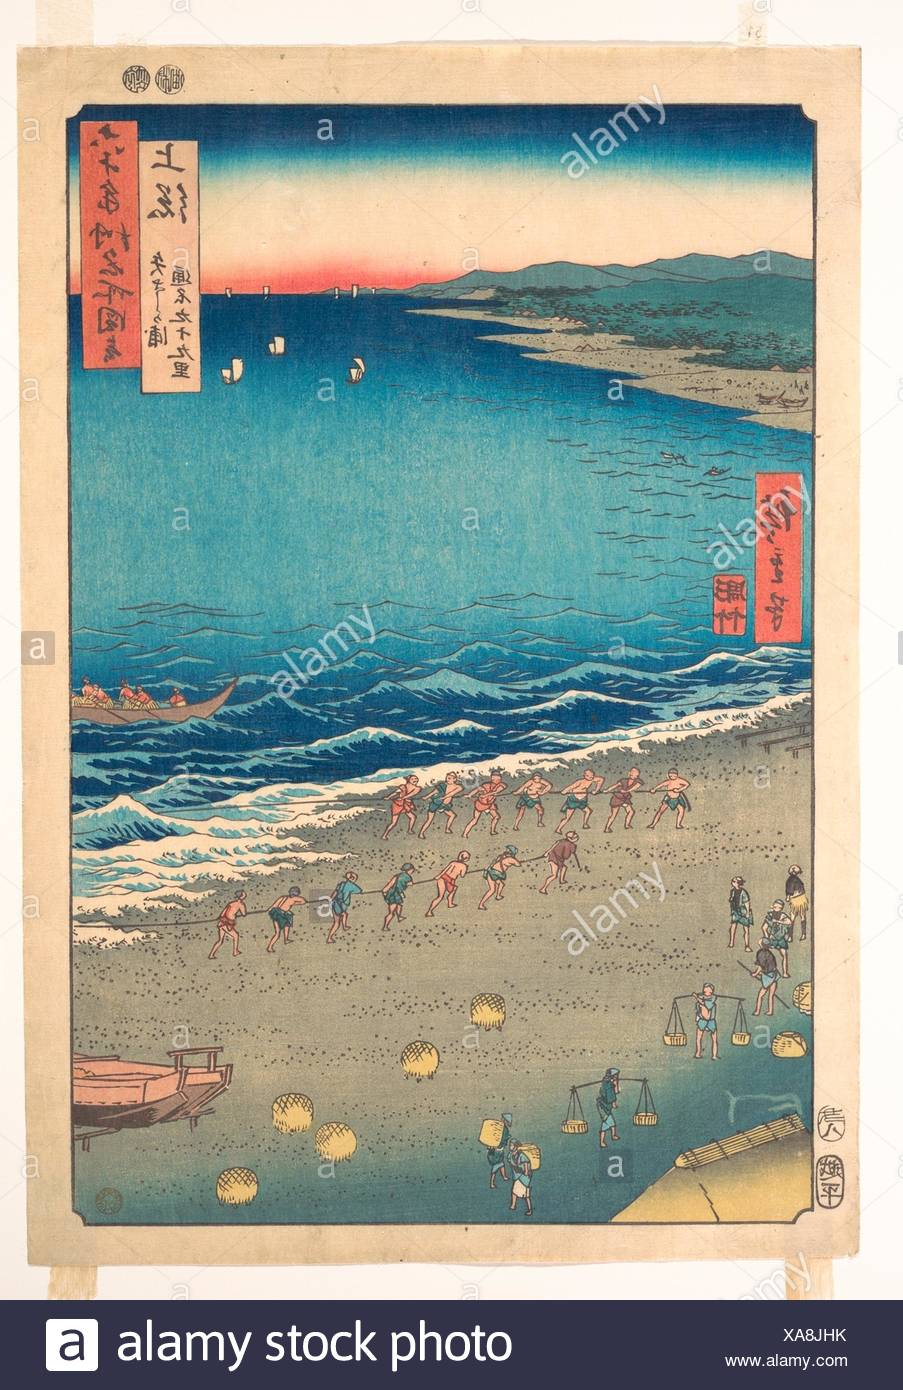 Yasashi Beach, known as Kujukuri, Kazusa Province, from the series Views of Famous Places in the Sixty-Odd Provinces. Artist: Utagawa Hiroshige Stock Photo